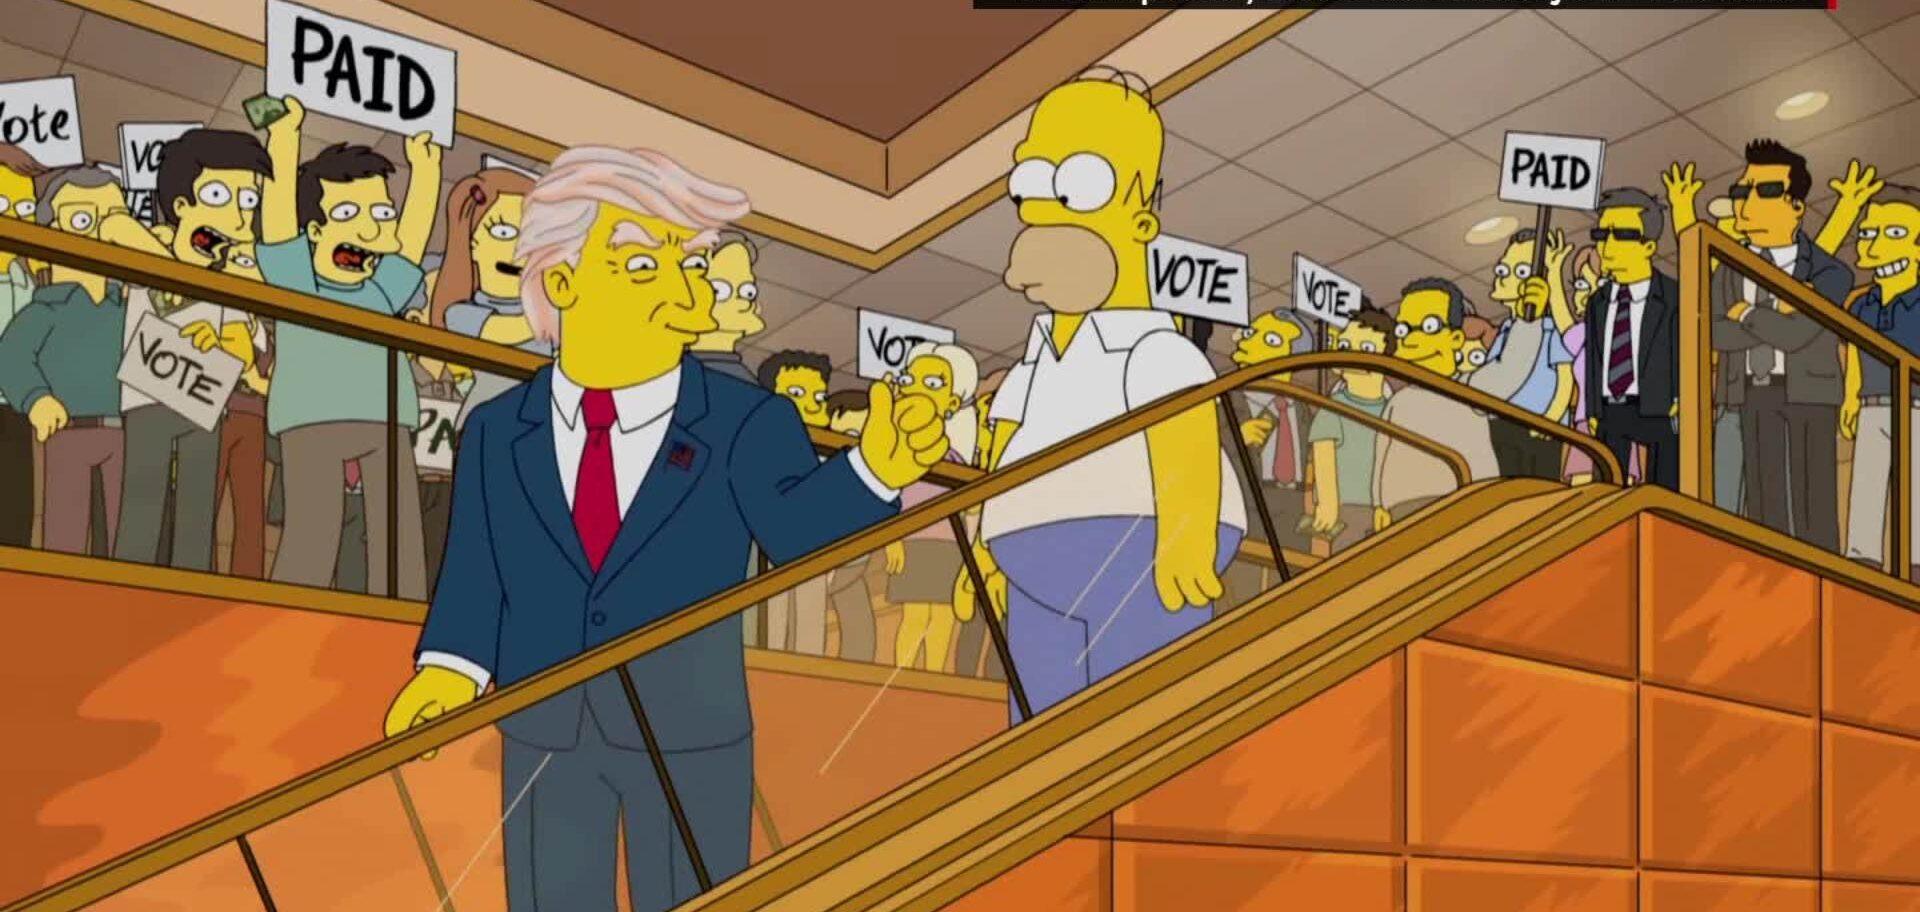 Immagine: Trump nei Simpson